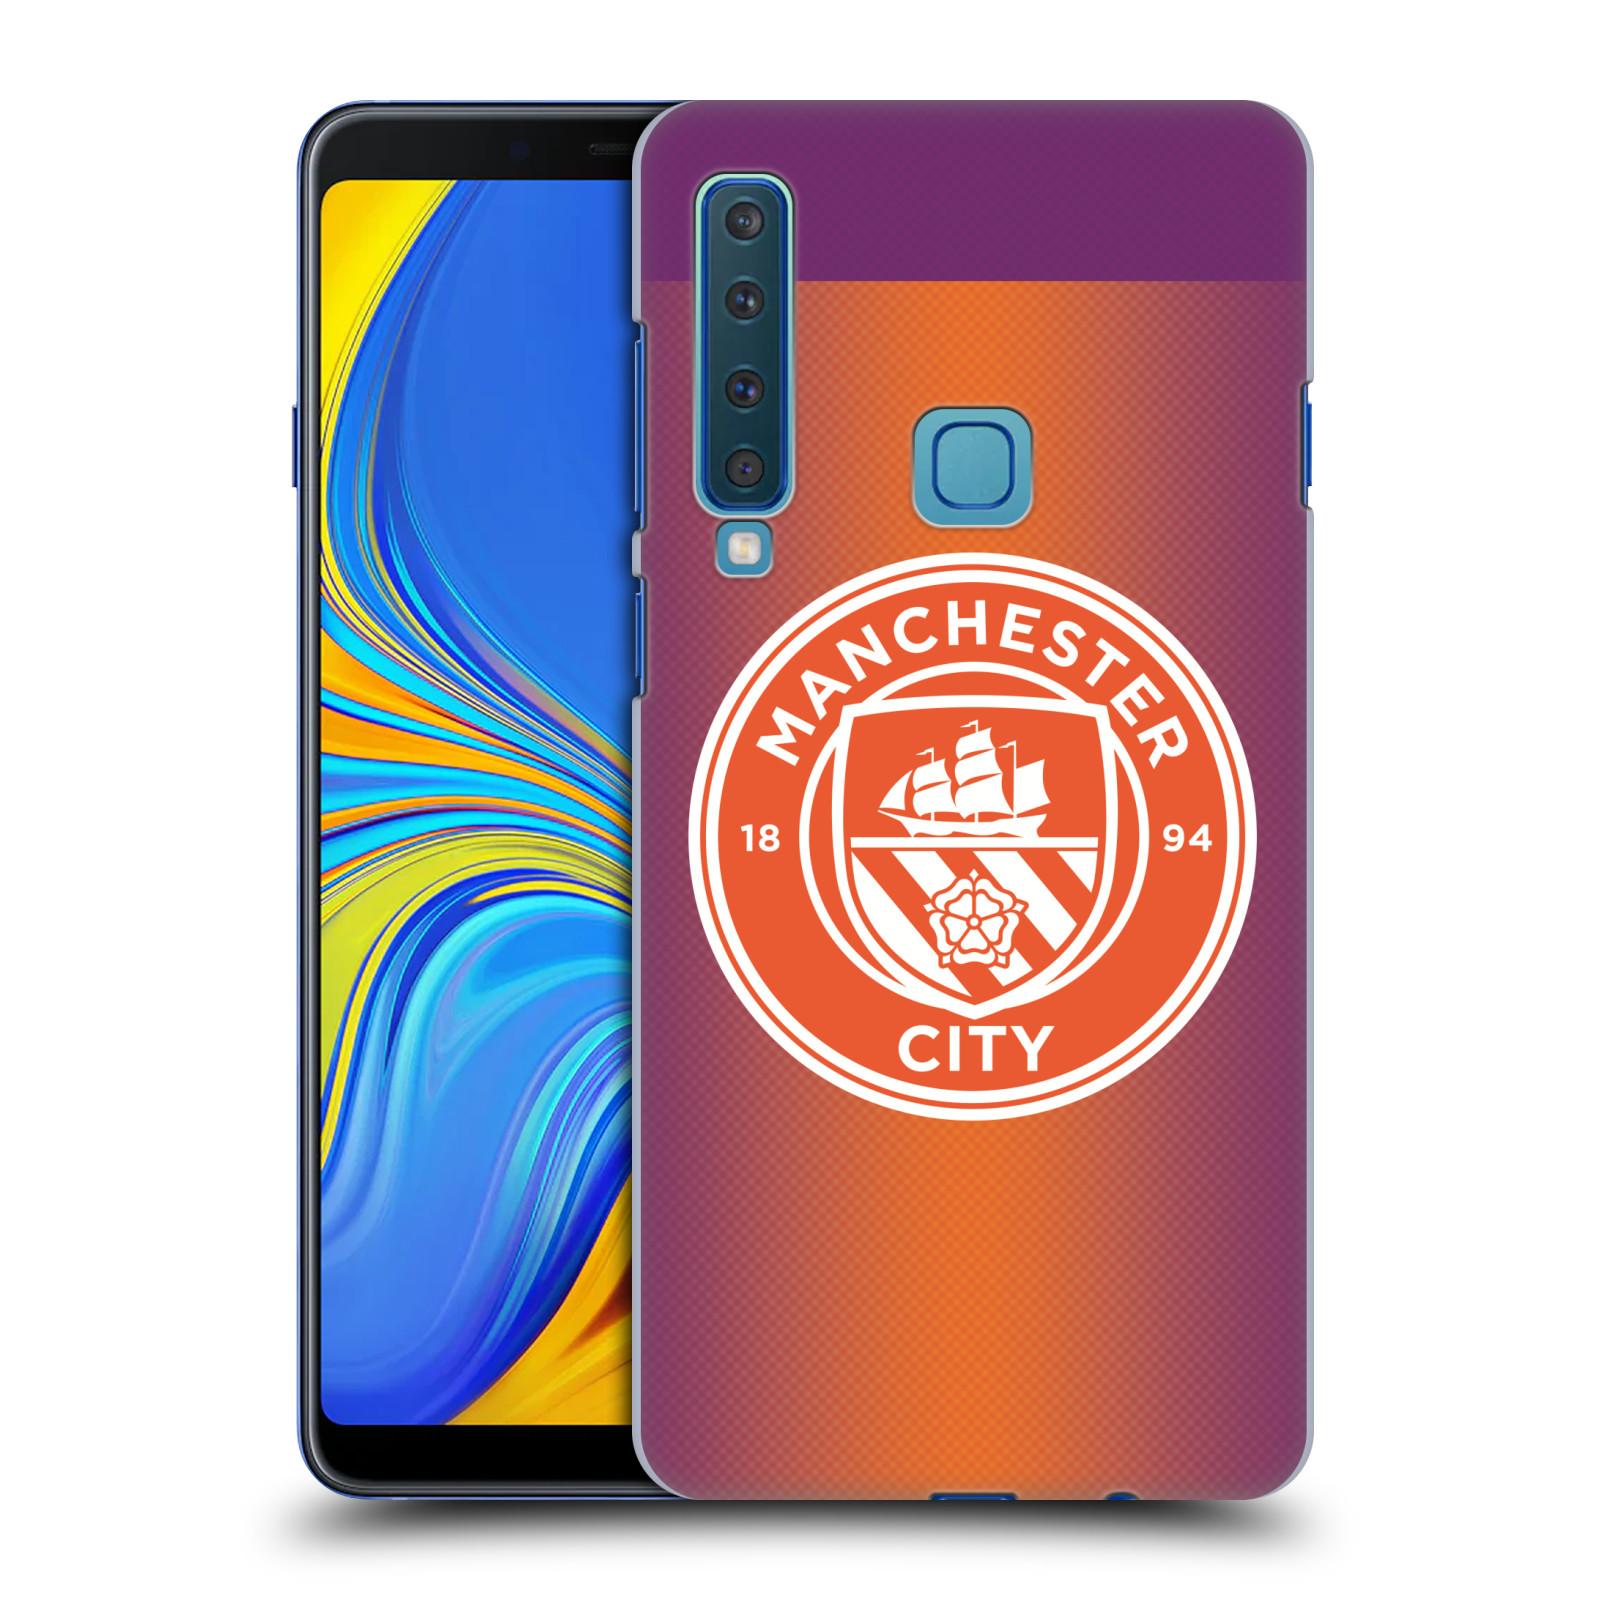 Plastové pouzdro na mobil Samsung Galaxy A9 (2018) - Head Case - Manchester City FC - Oranžové nové logo